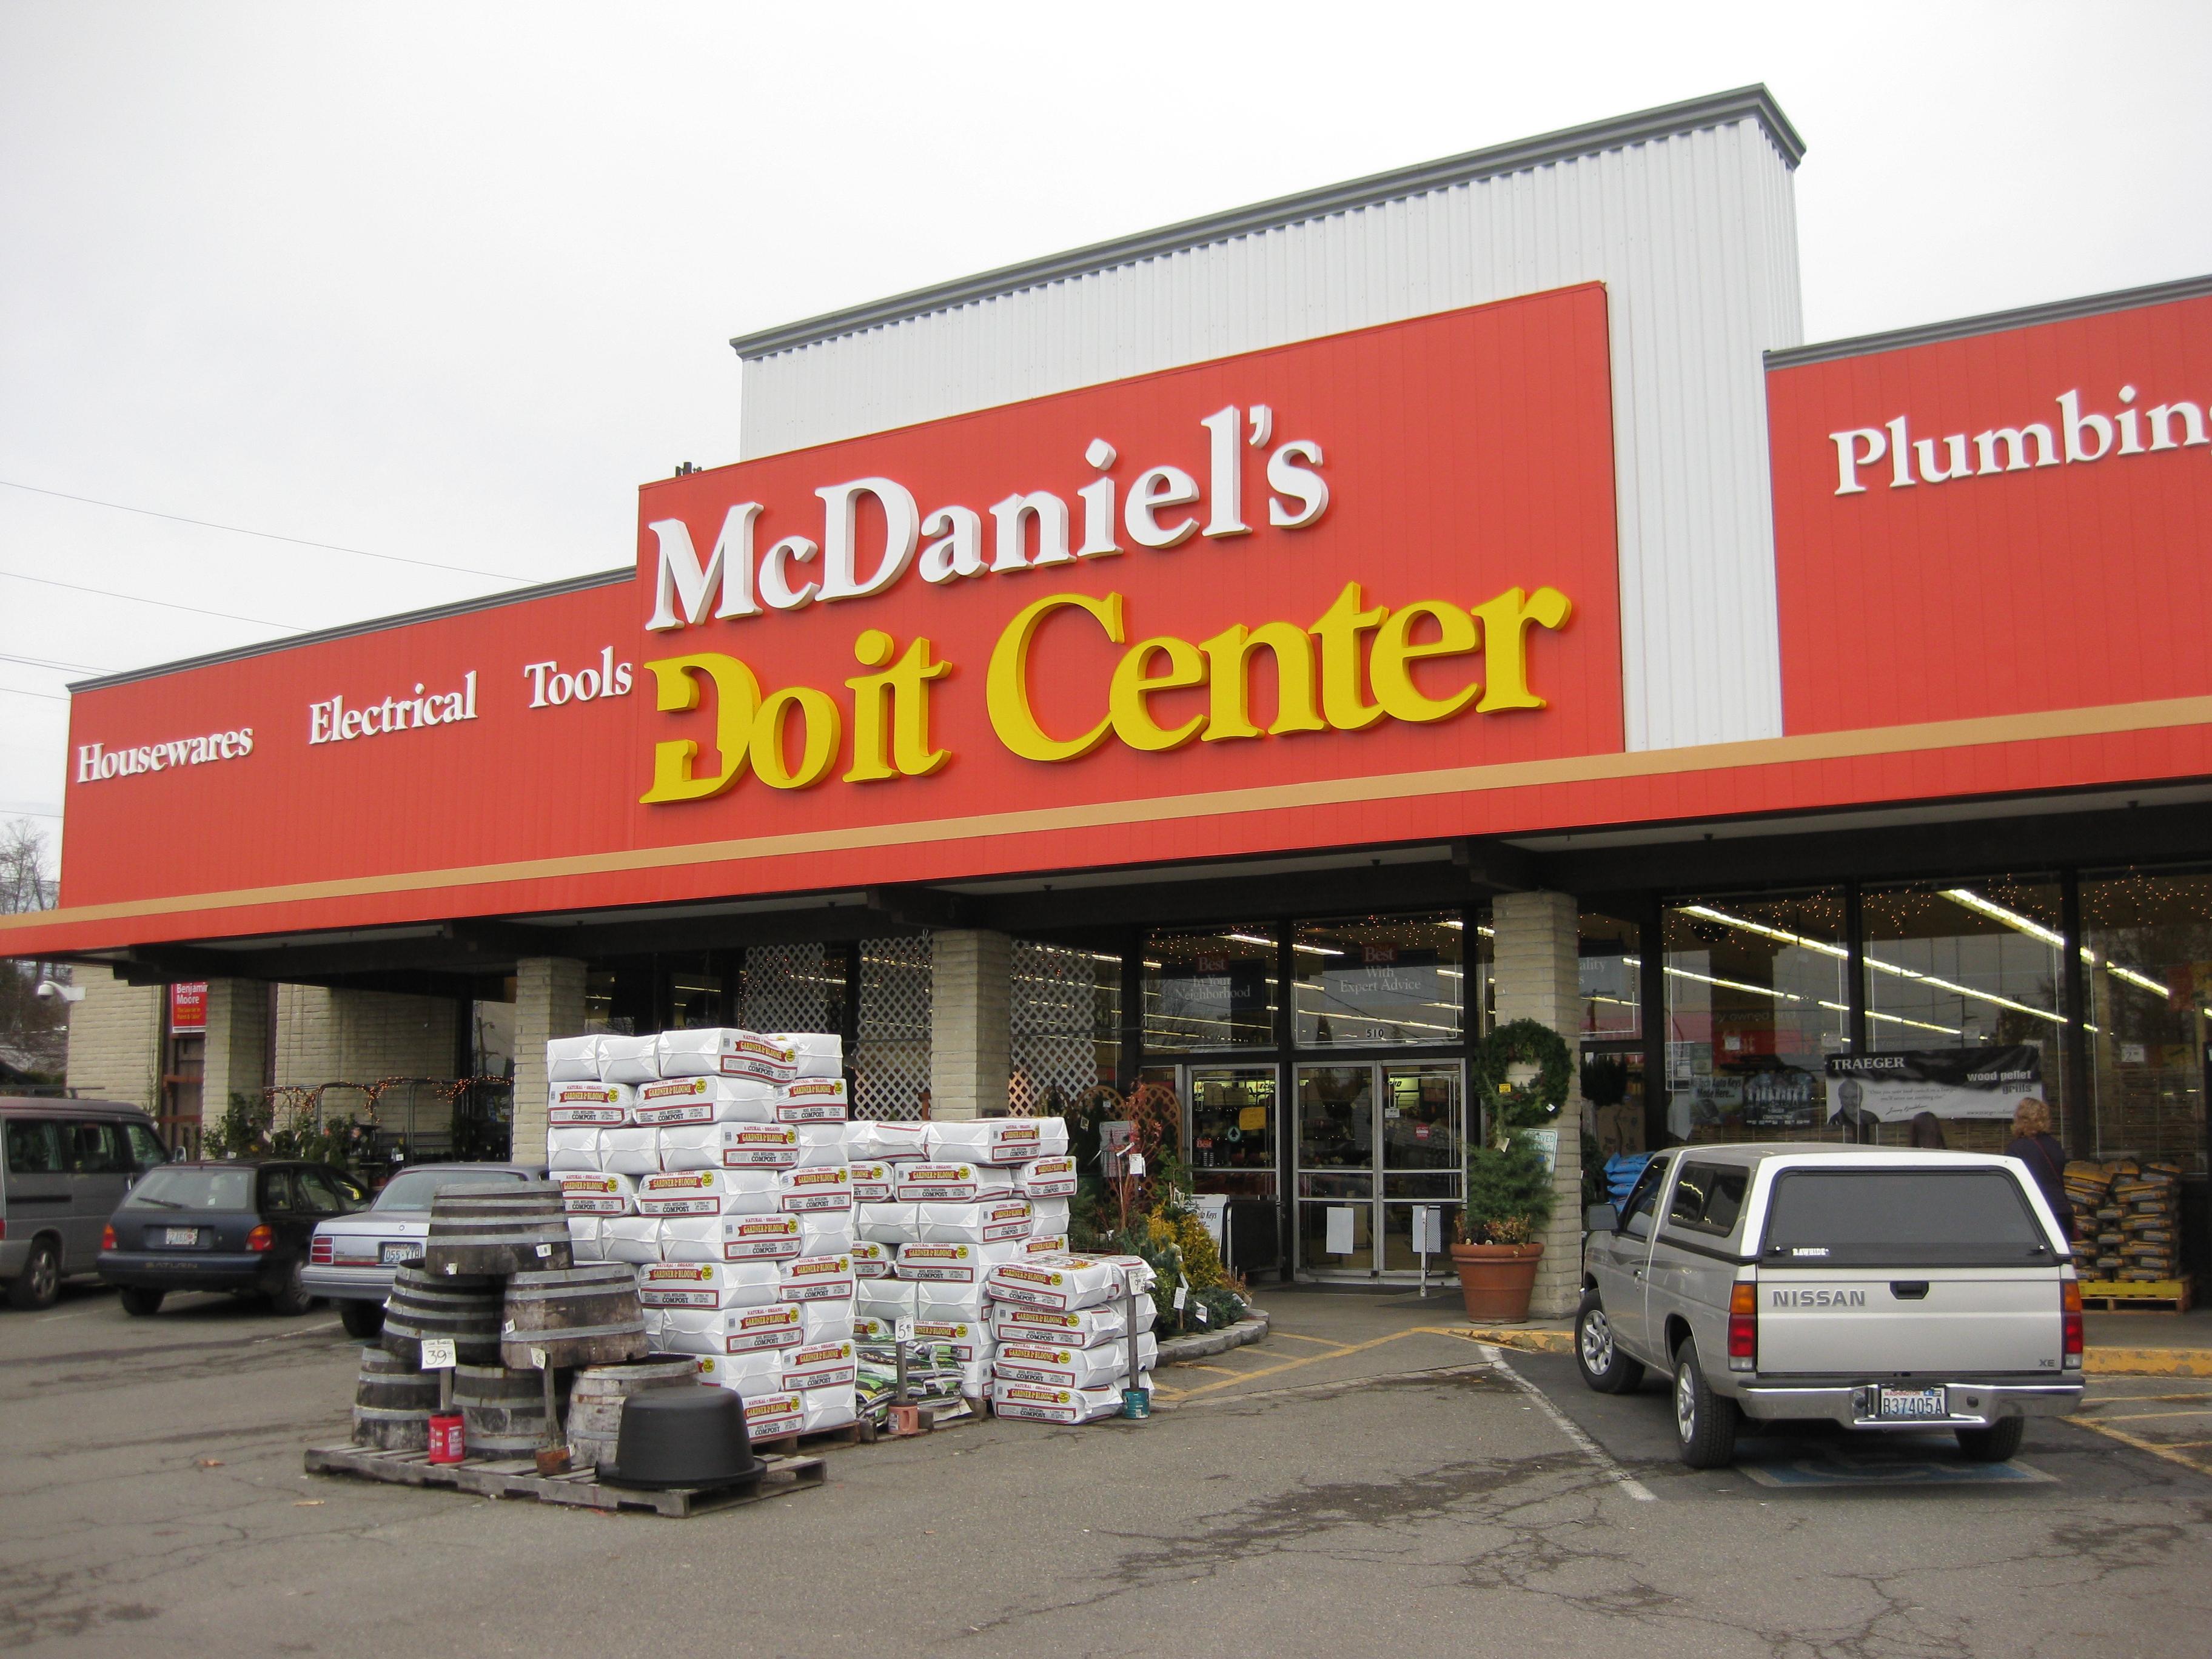 Filedo it best corp mcdaniels do it center exteriorg filedo it best corp mcdaniels do it center exteriorg solutioingenieria Images